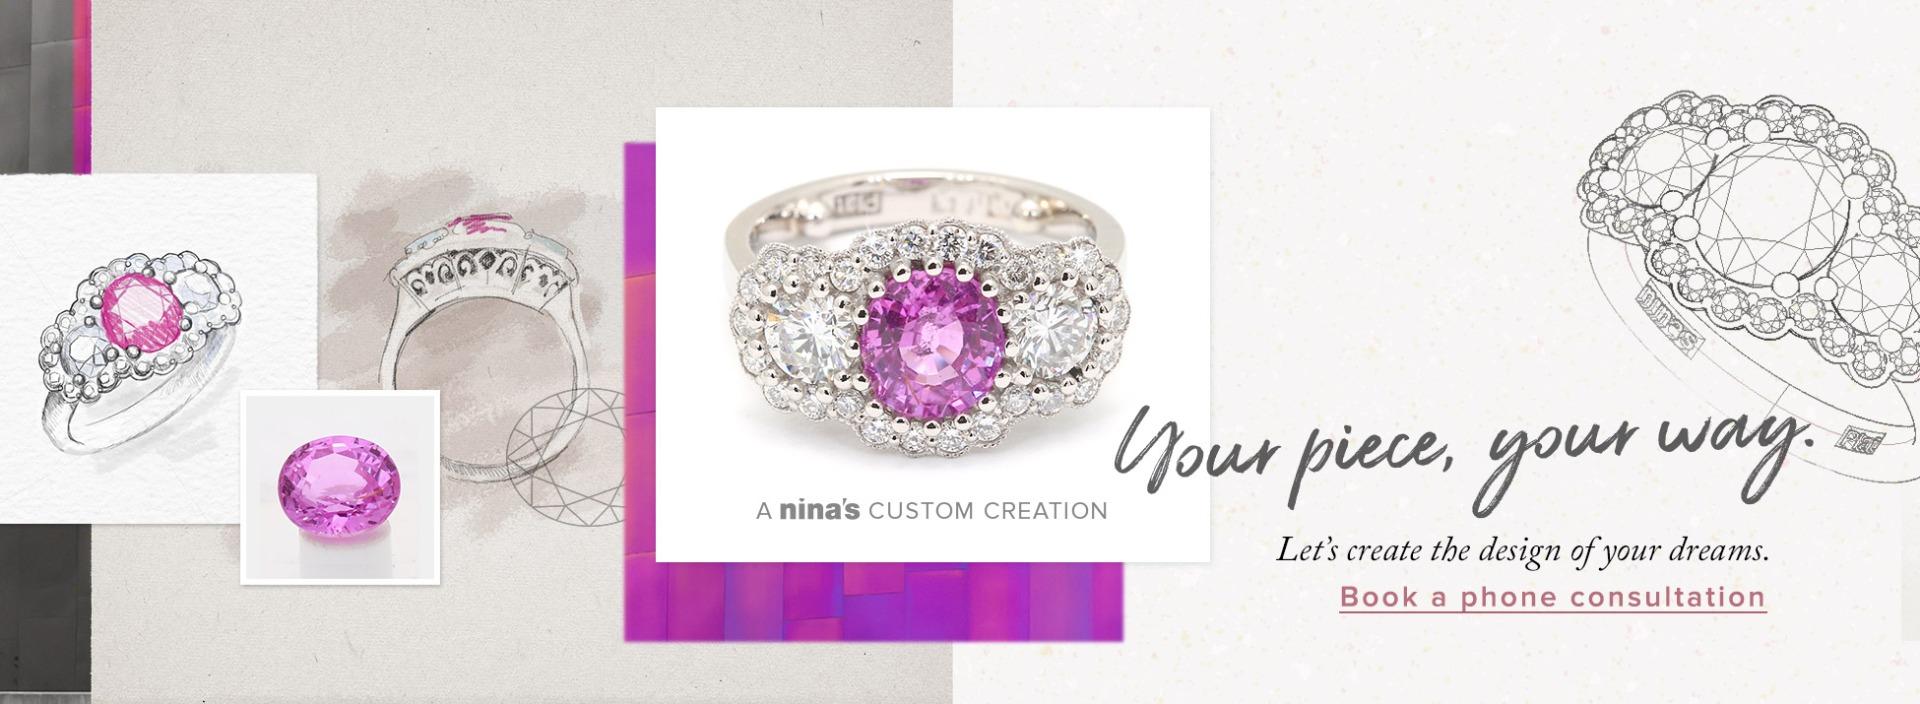 Design your own jewellery with Australian diamonds